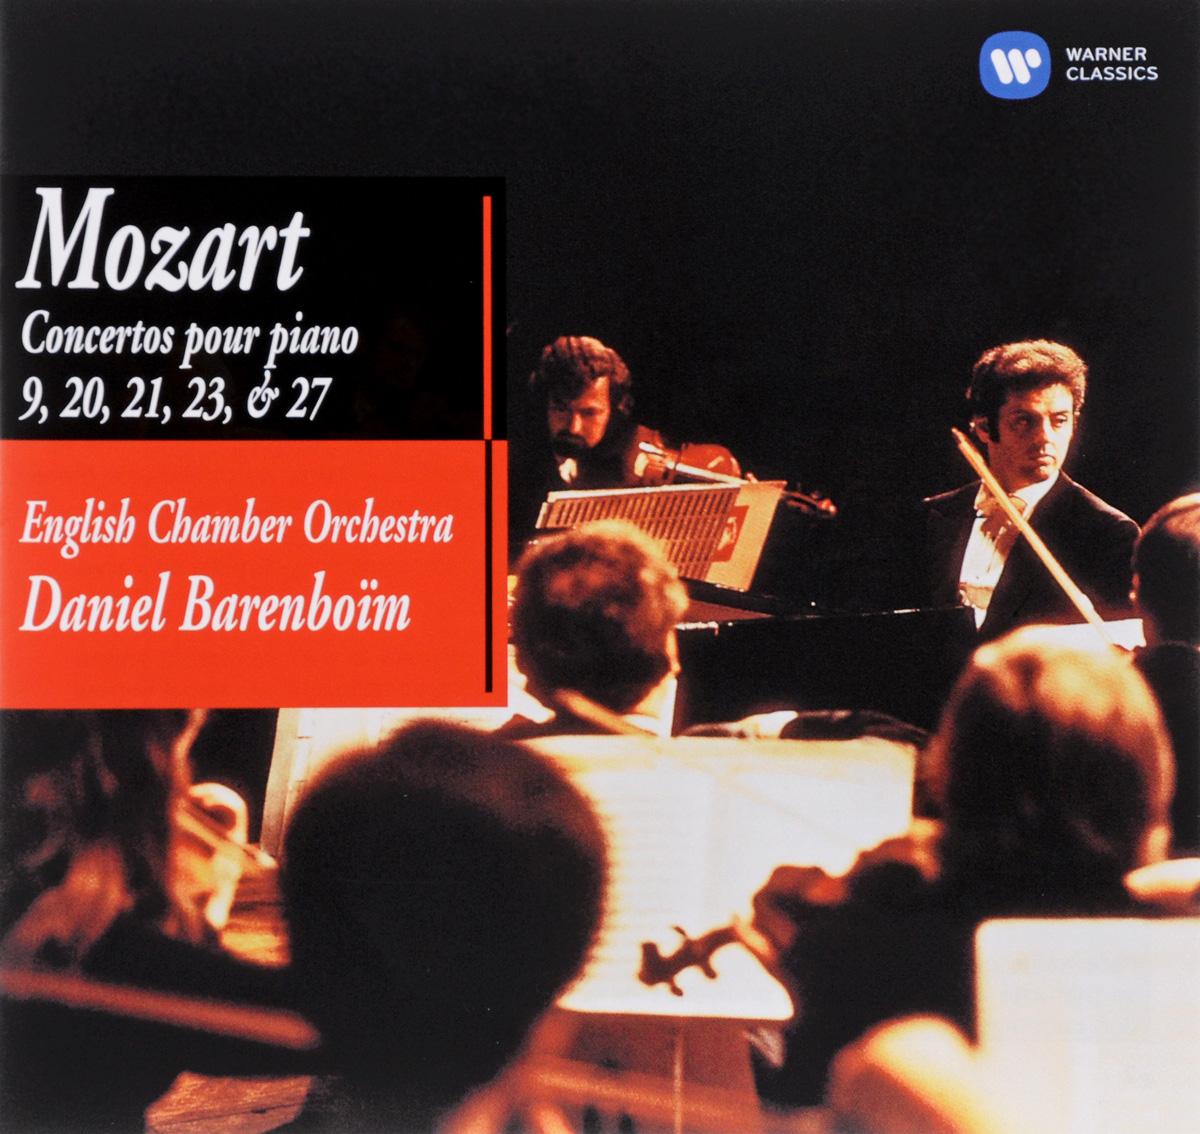 Дэниэл Баренбойм,English Chamber Orchestra Daniel Barenboim. English Chamber Orchestra Piano Concerto Nos. 9, 20, 21, 23 & 27 (2 CD)